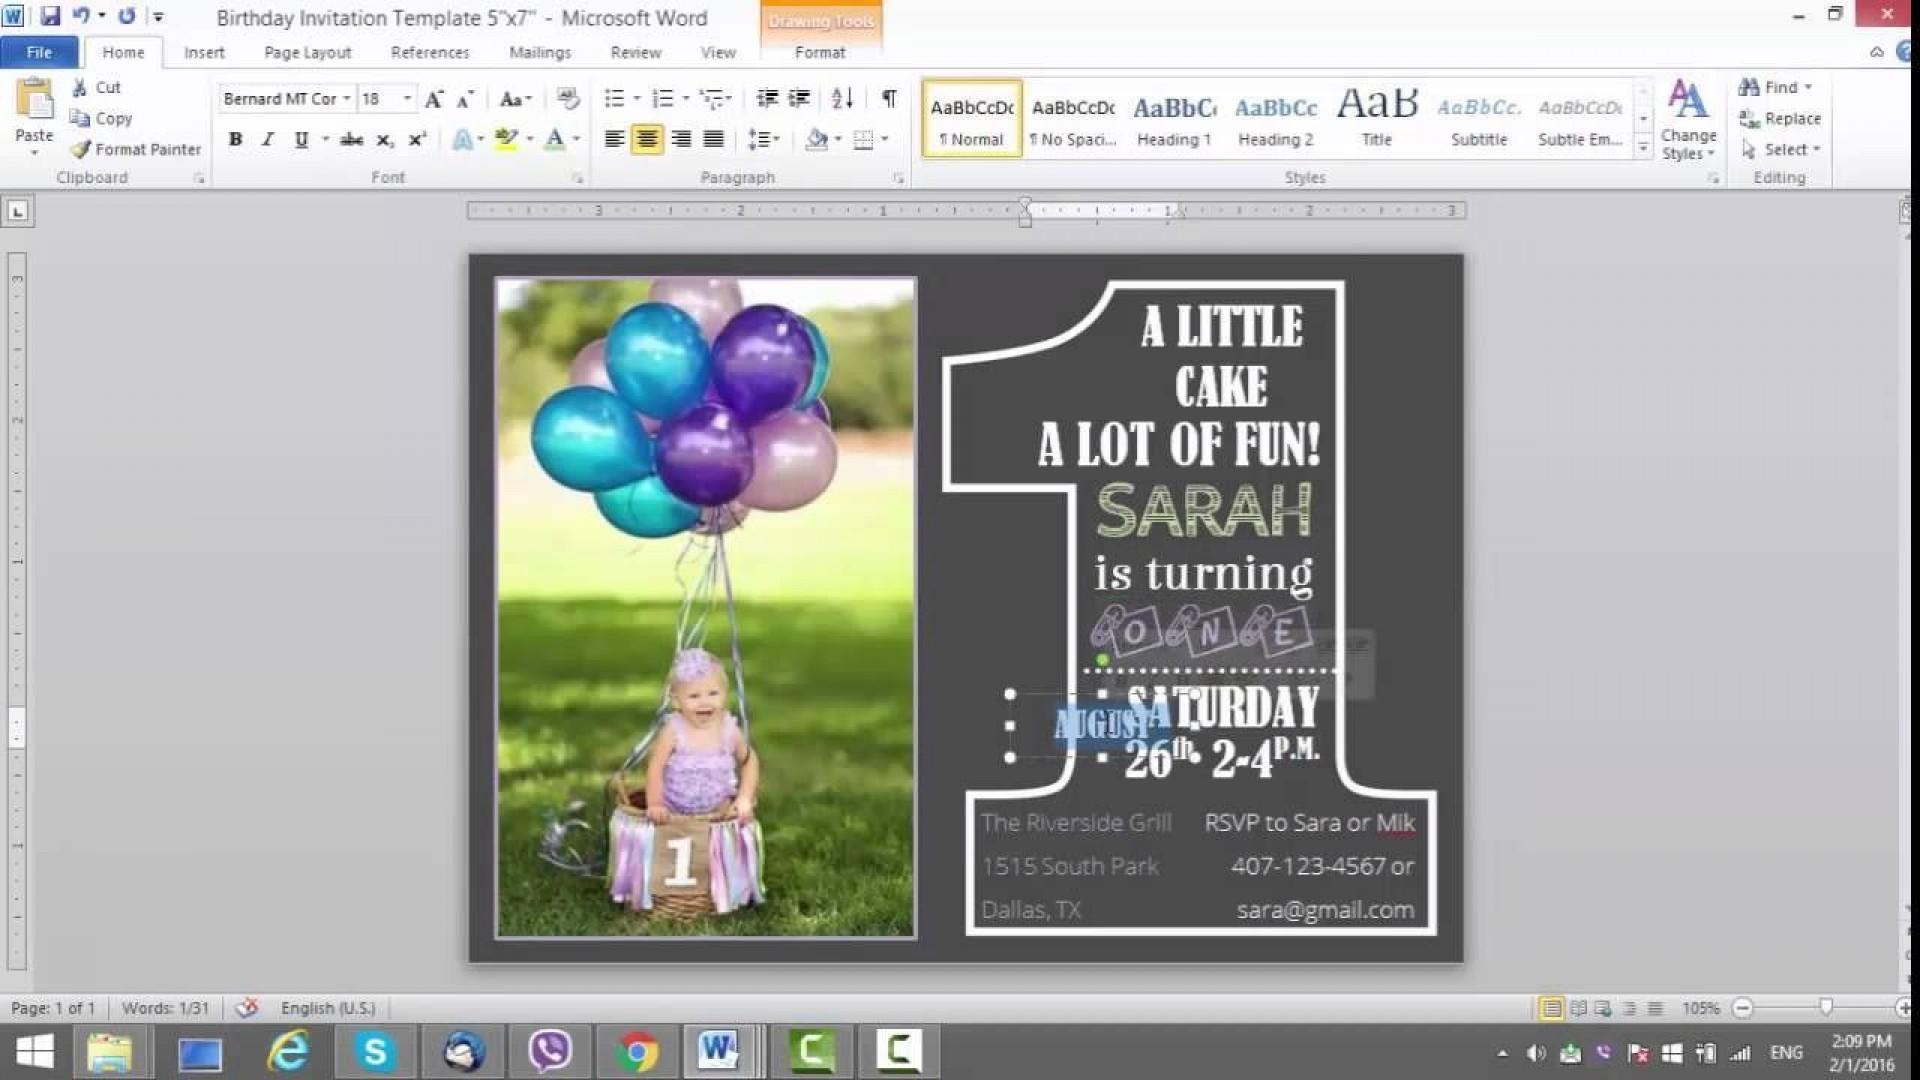 006 Singular Microsoft Word Birthday Invitation Template Photo  Editable 50th 60th1920